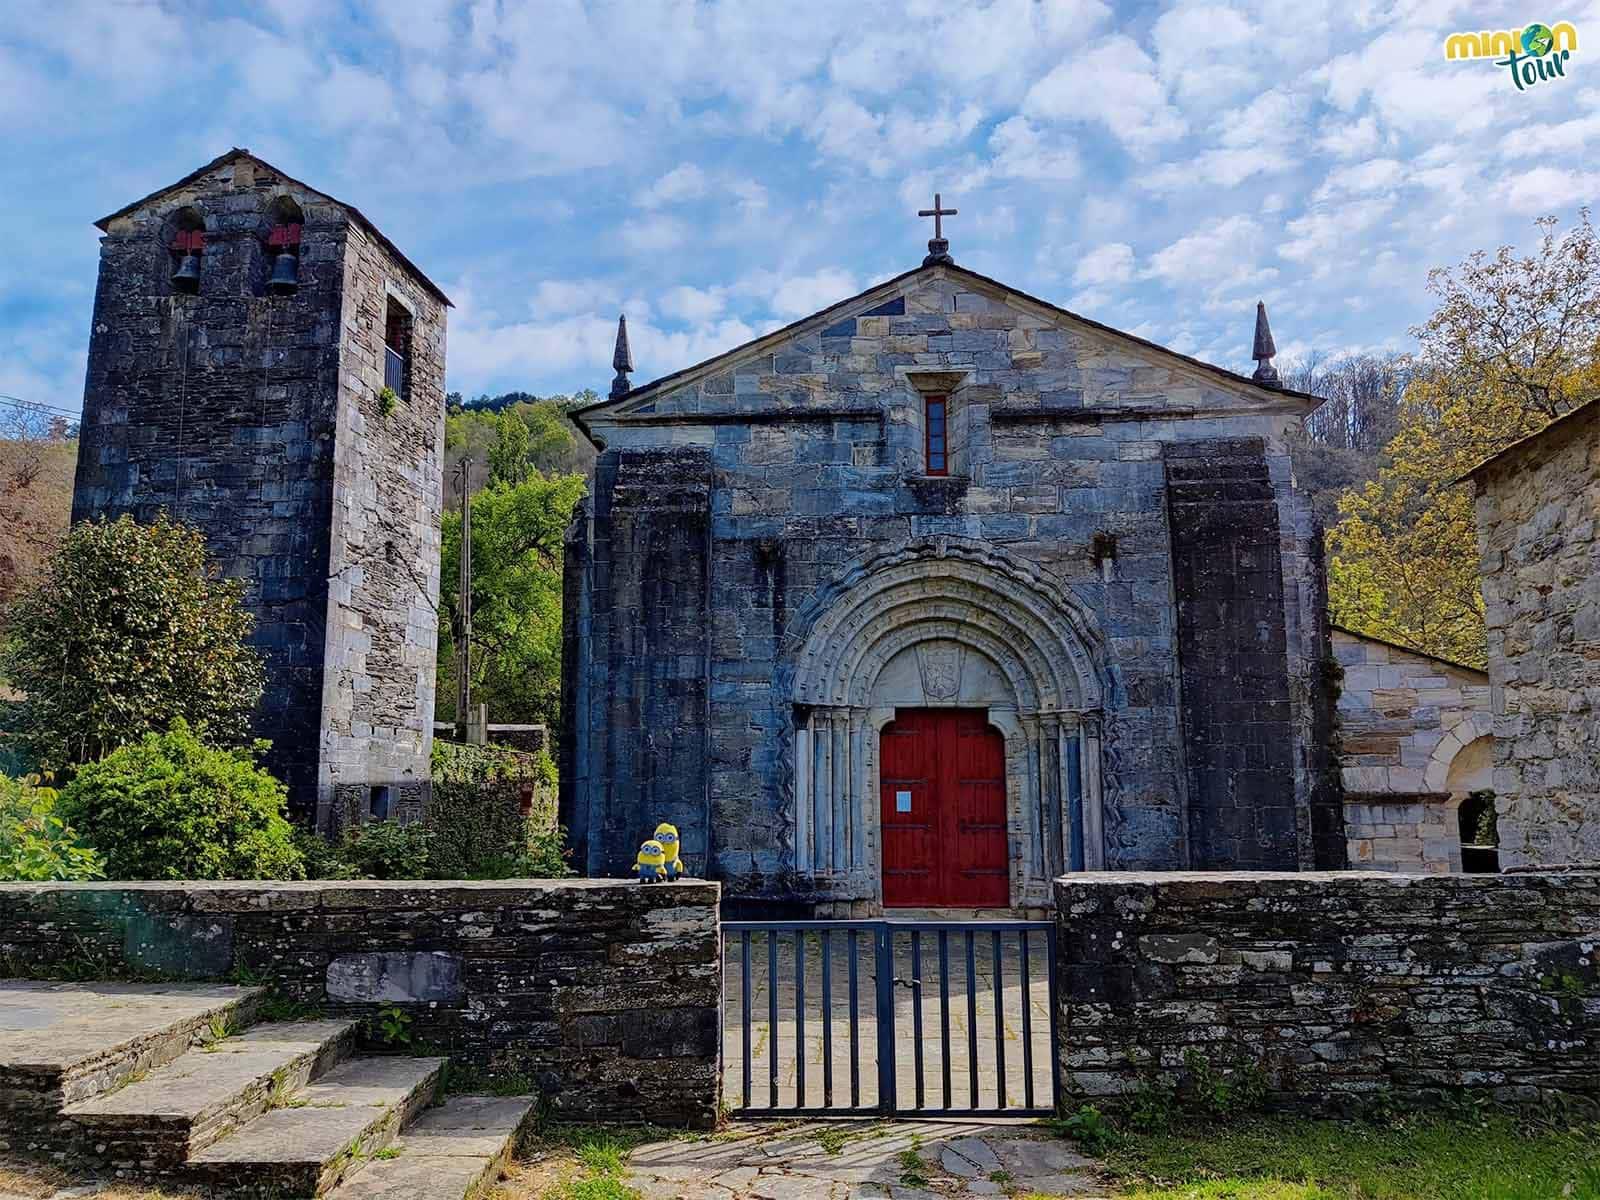 La Iglesia de San Pedro Fiz de Hospital do Incio, la única iglesia románica de mármol de España